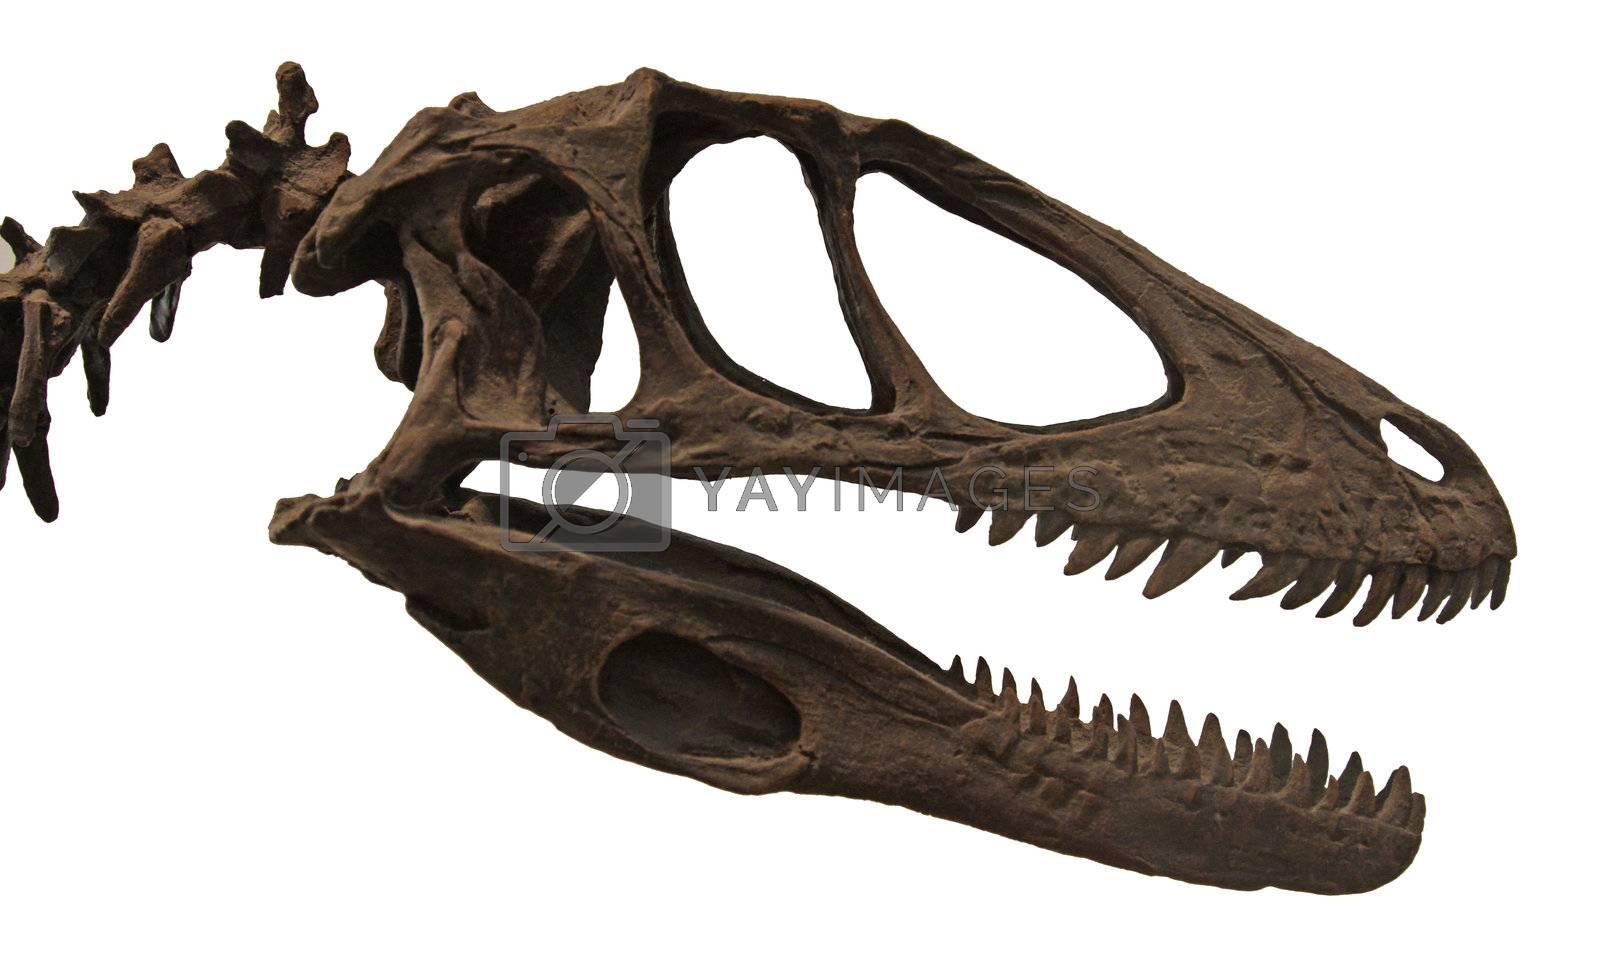 The fossilized skull of the dinosaur Deinonychus antirrhopus.